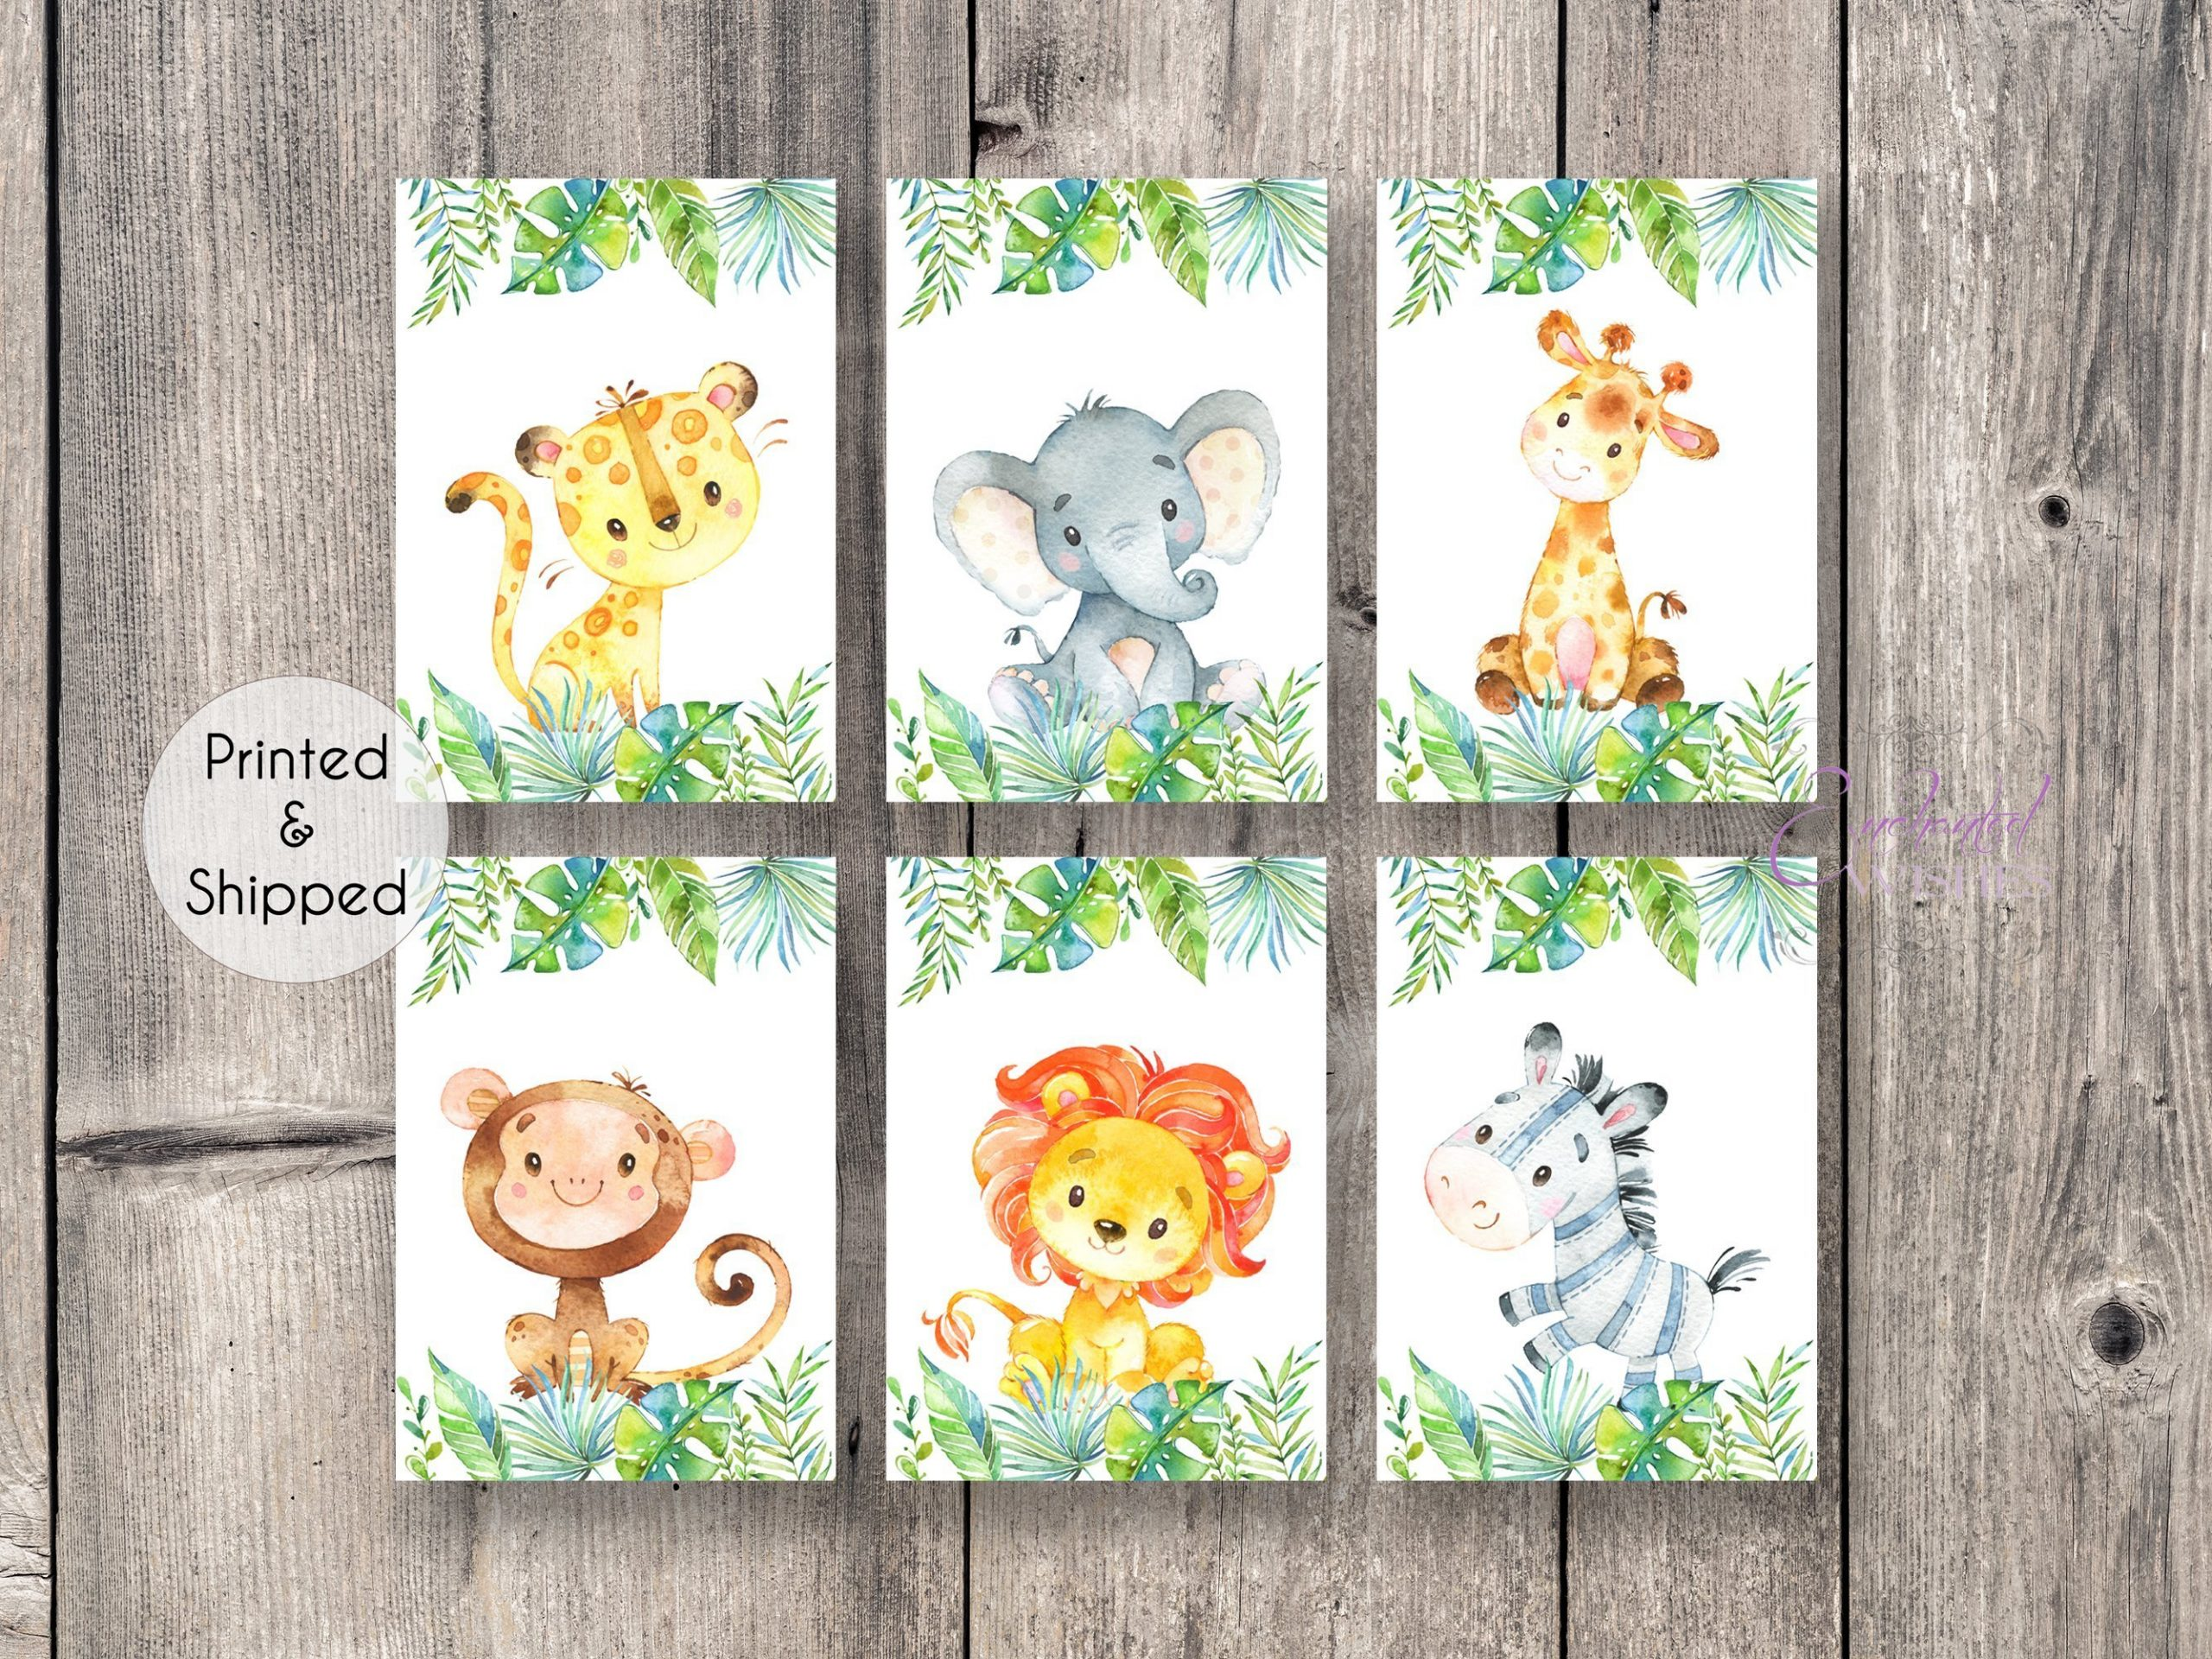 Unframed Jungle Animal Nursery Prints Set of 6 Gender Neutral Nursery Wall Art